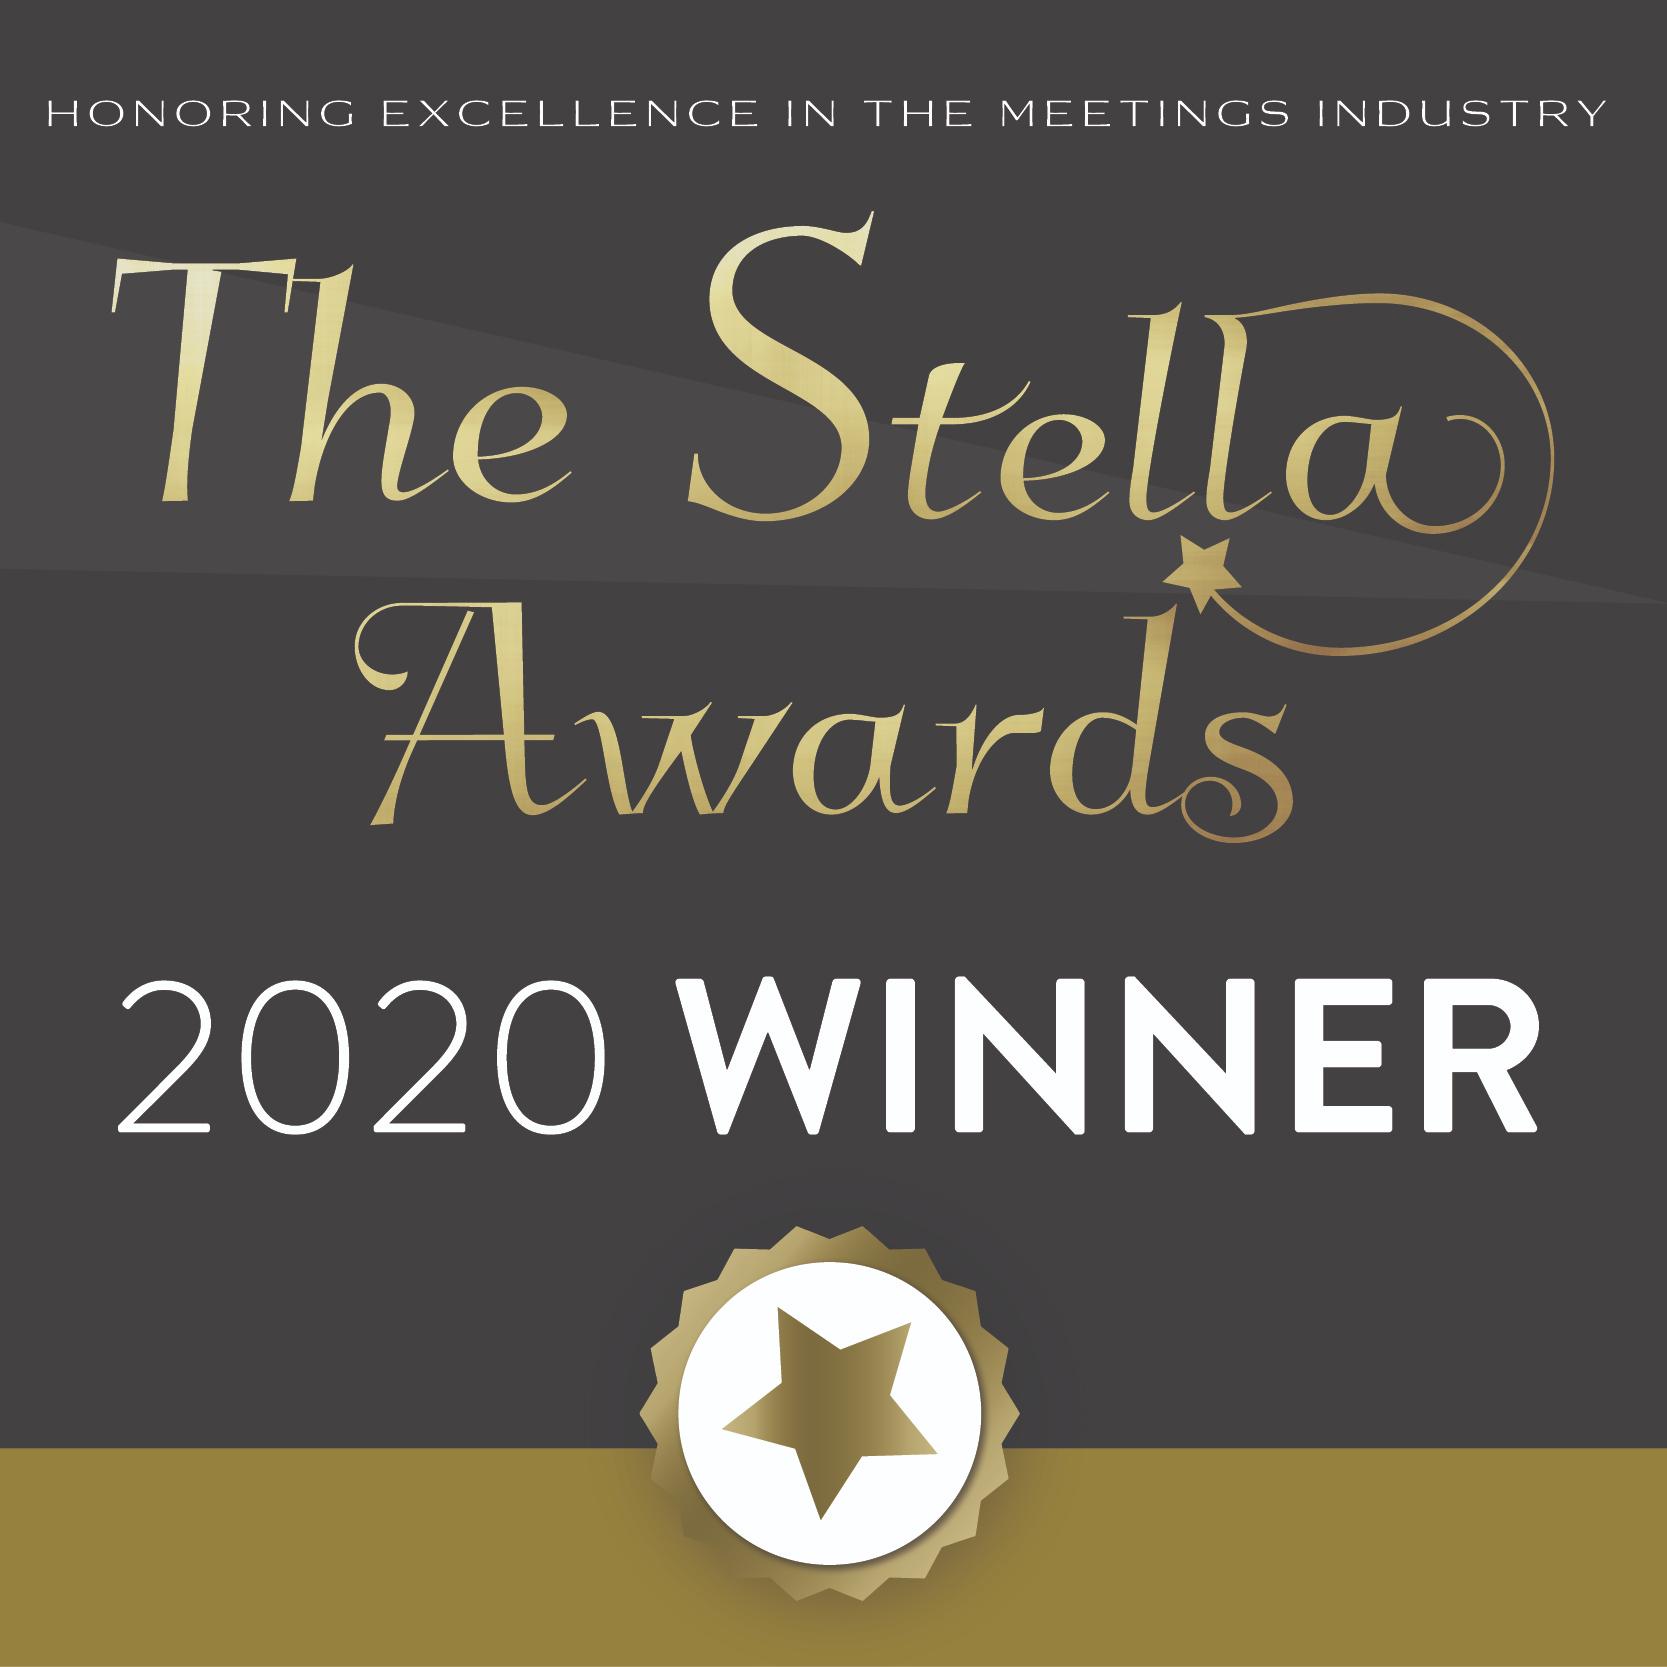 The Stella Awards 2020